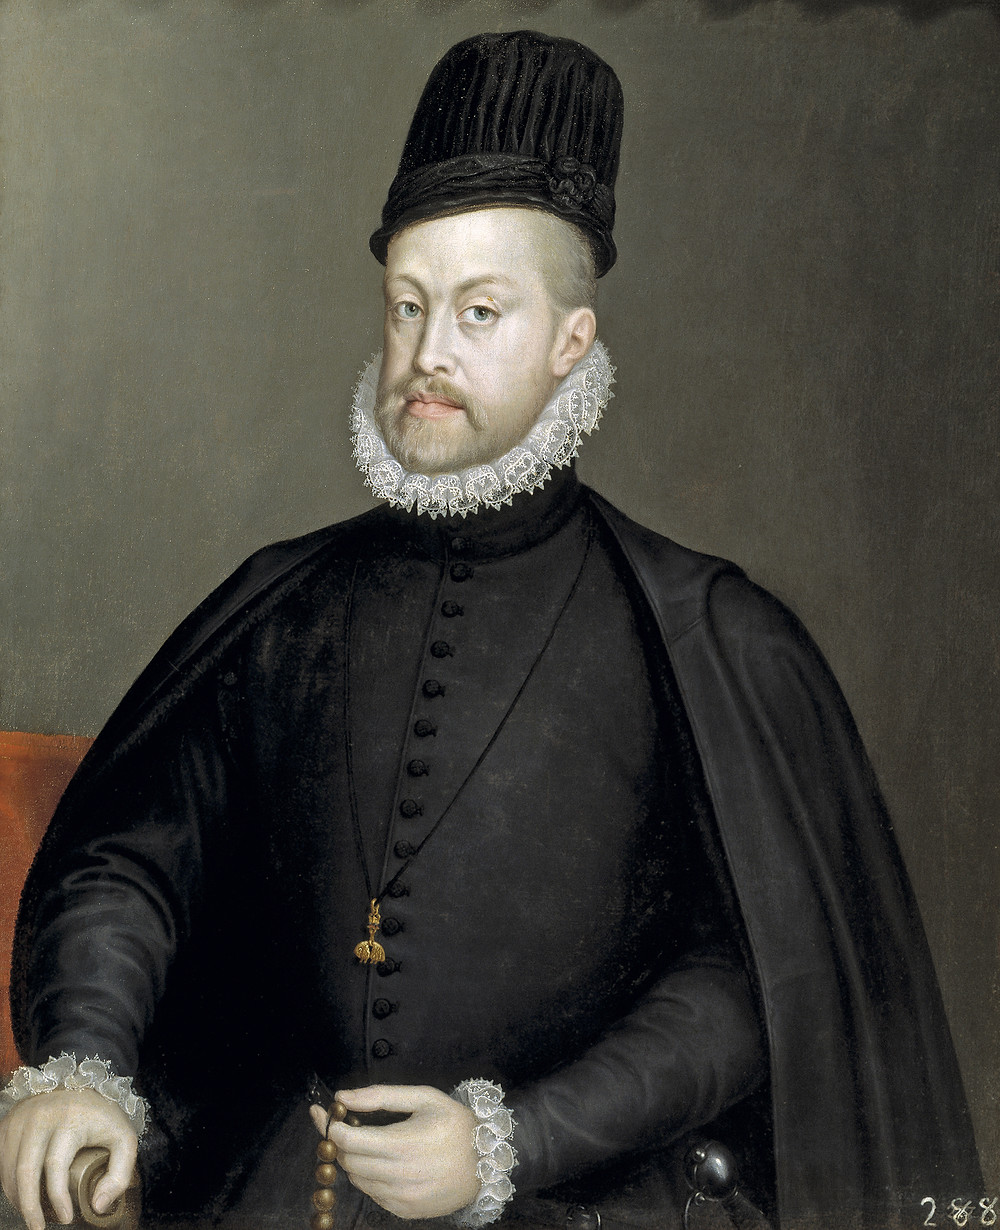 portrait Felipe II negro black singular history fashion history